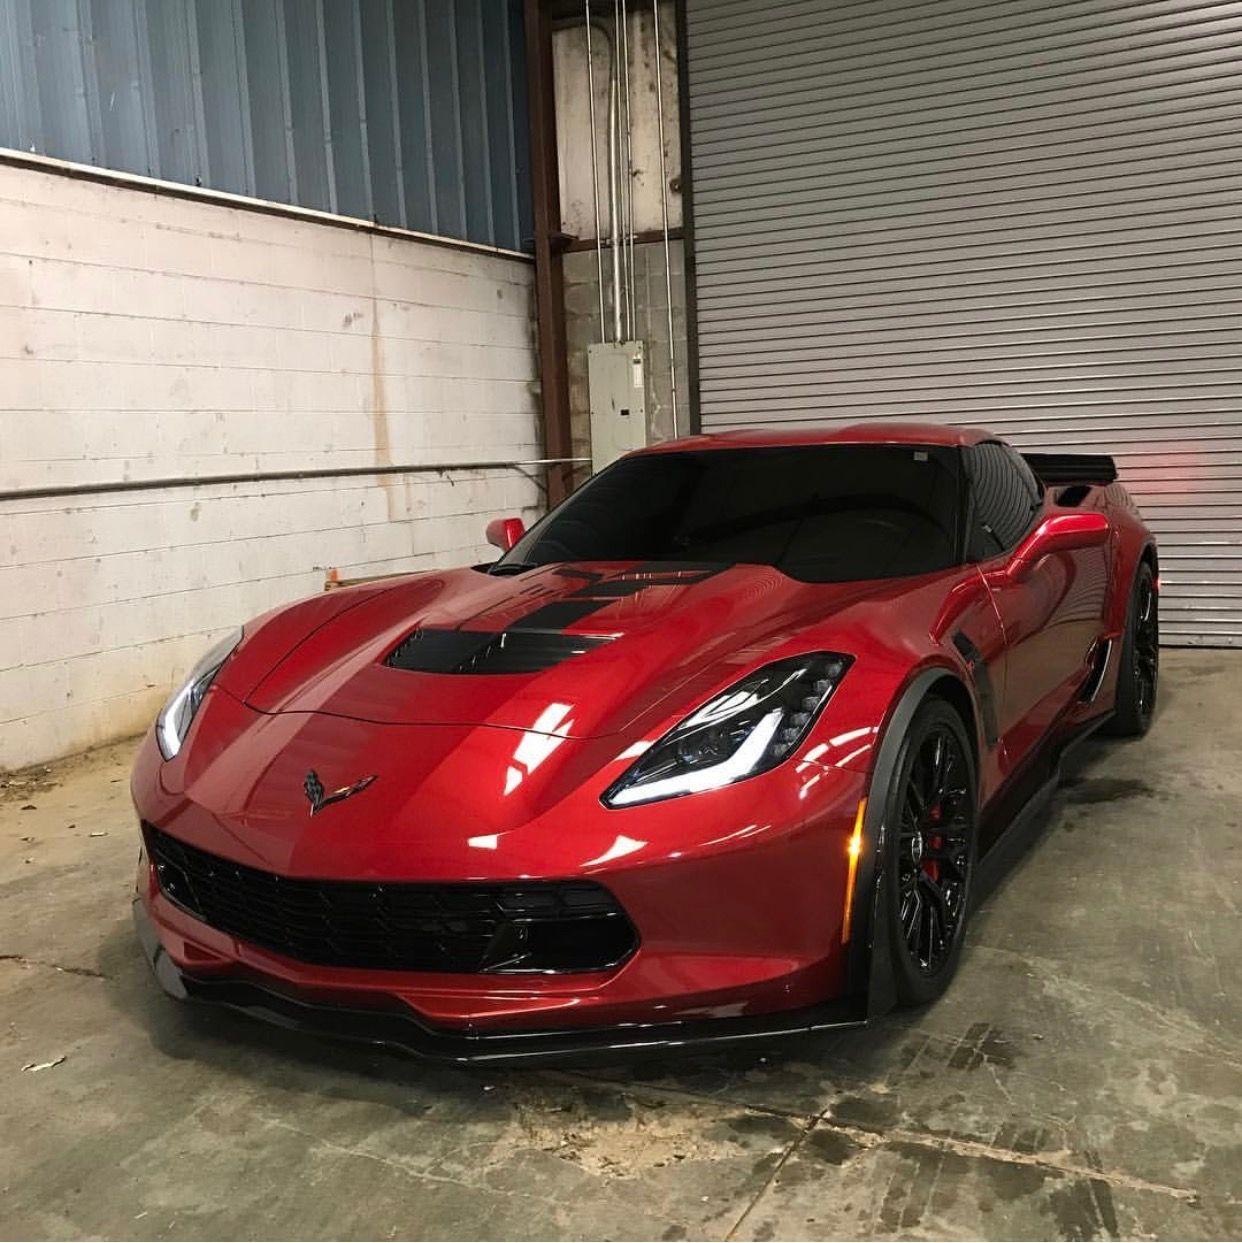 Chevrolet Corvette C7 Z06 Painted In Long Beach Red